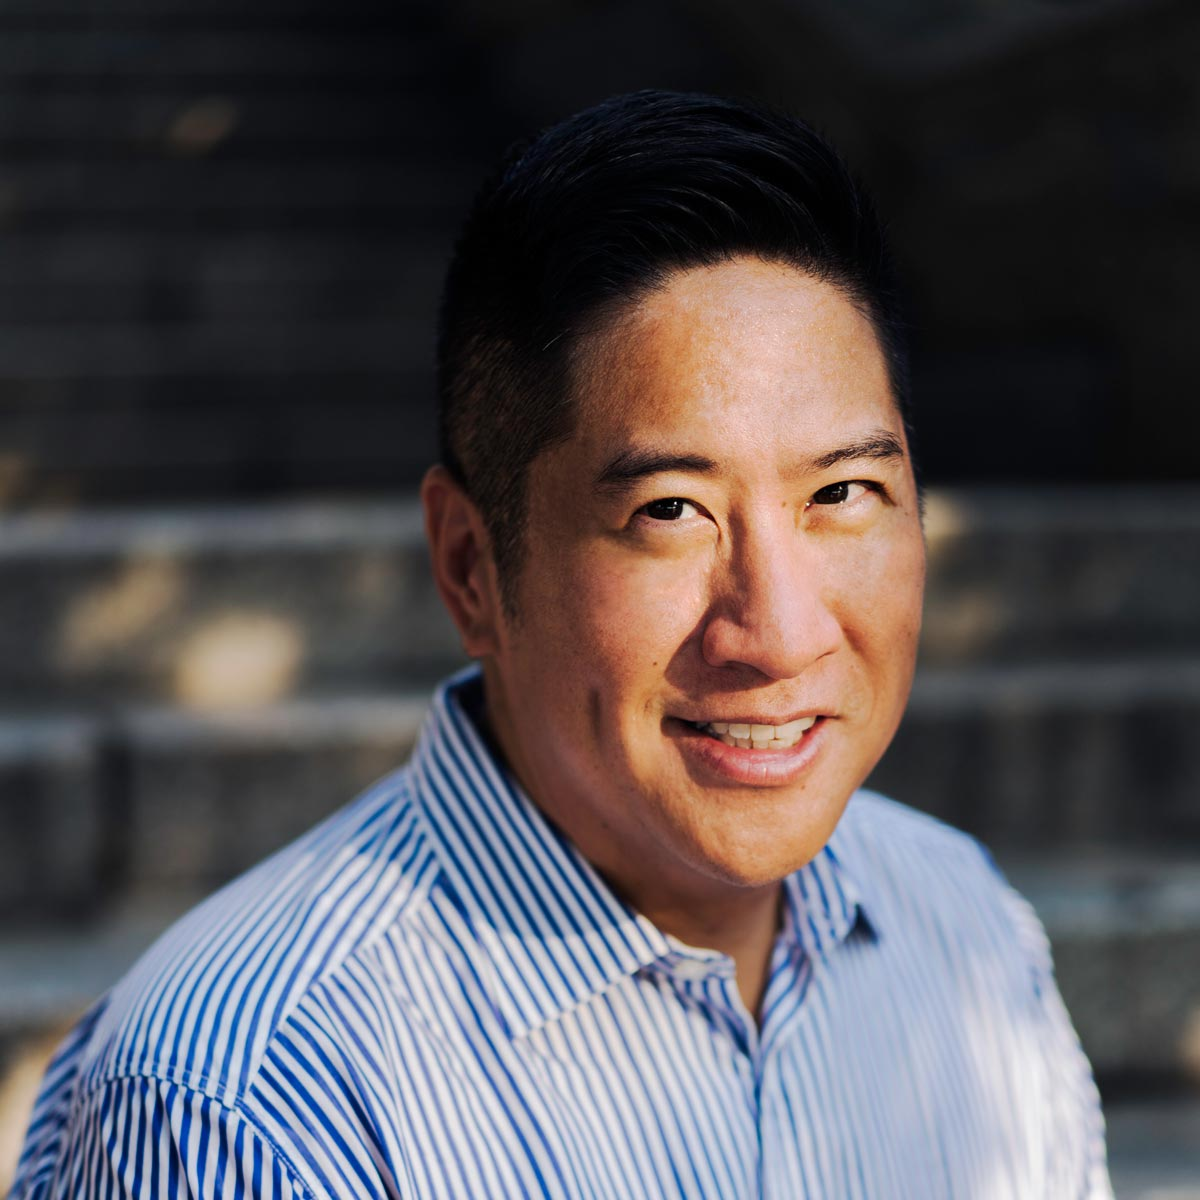 Michael Snider – ArtSmart Director of External Affairs